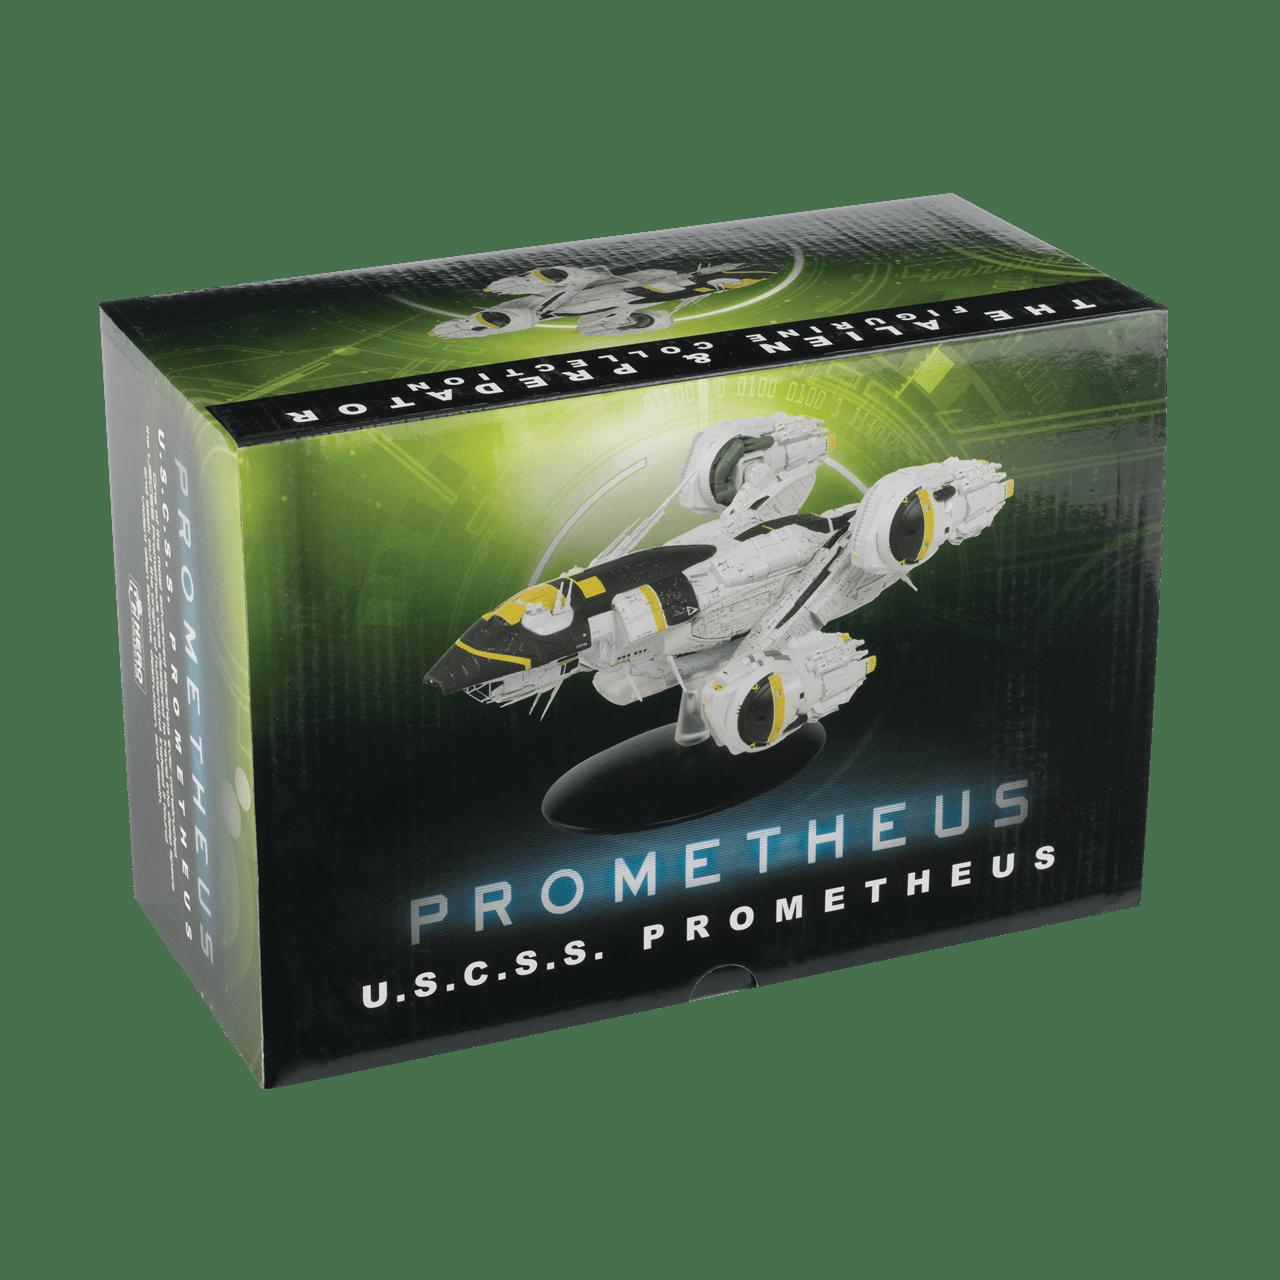 Alien: U.S.C.S.S. Prometheus Ship Hero Collector - 4